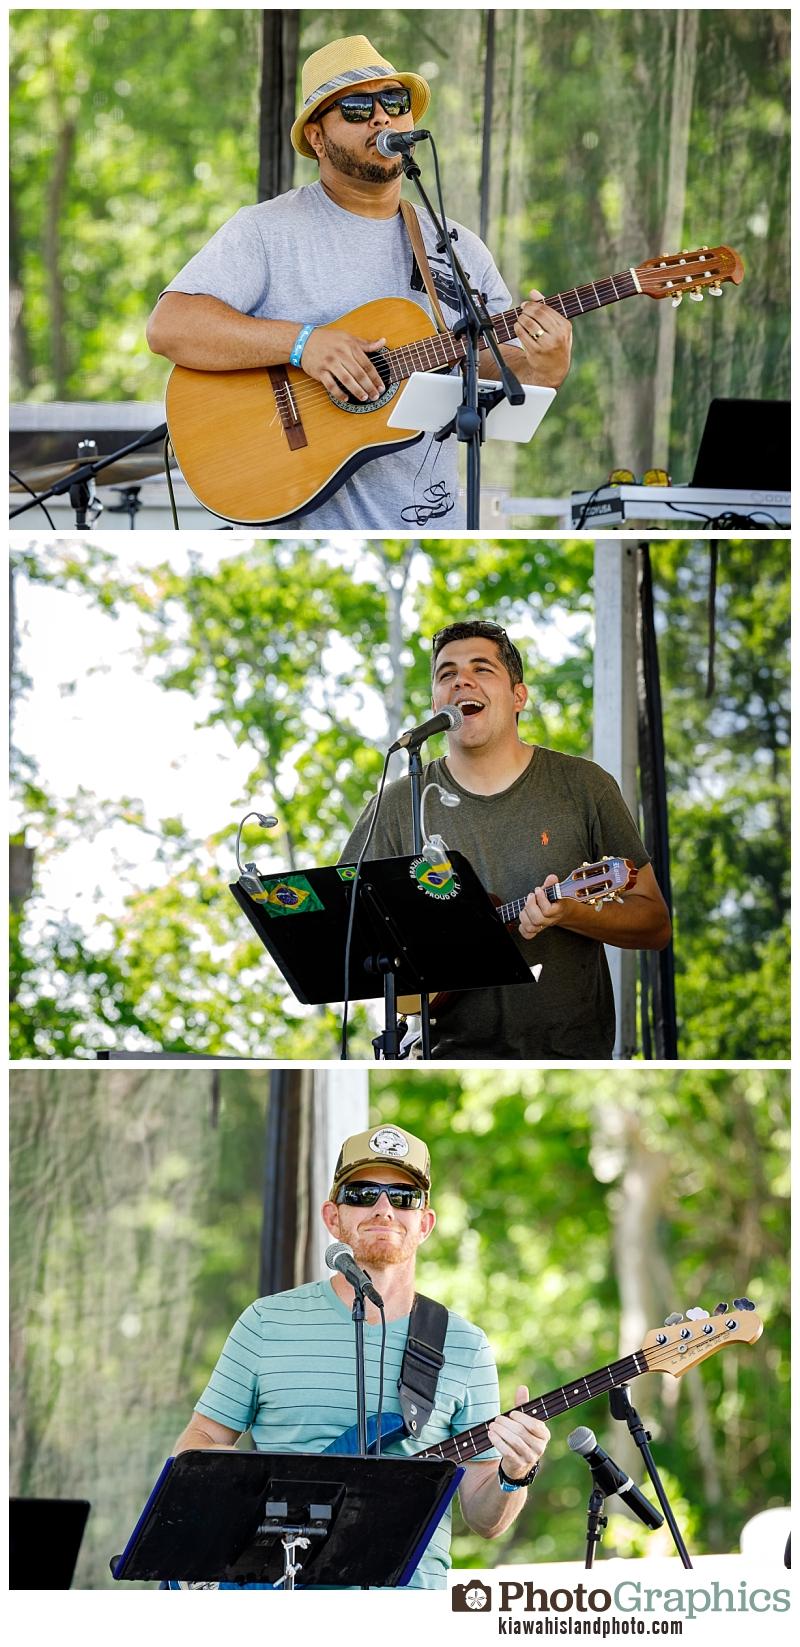 Kiawah Event Photographer - Charleston Beer Garden Event performances